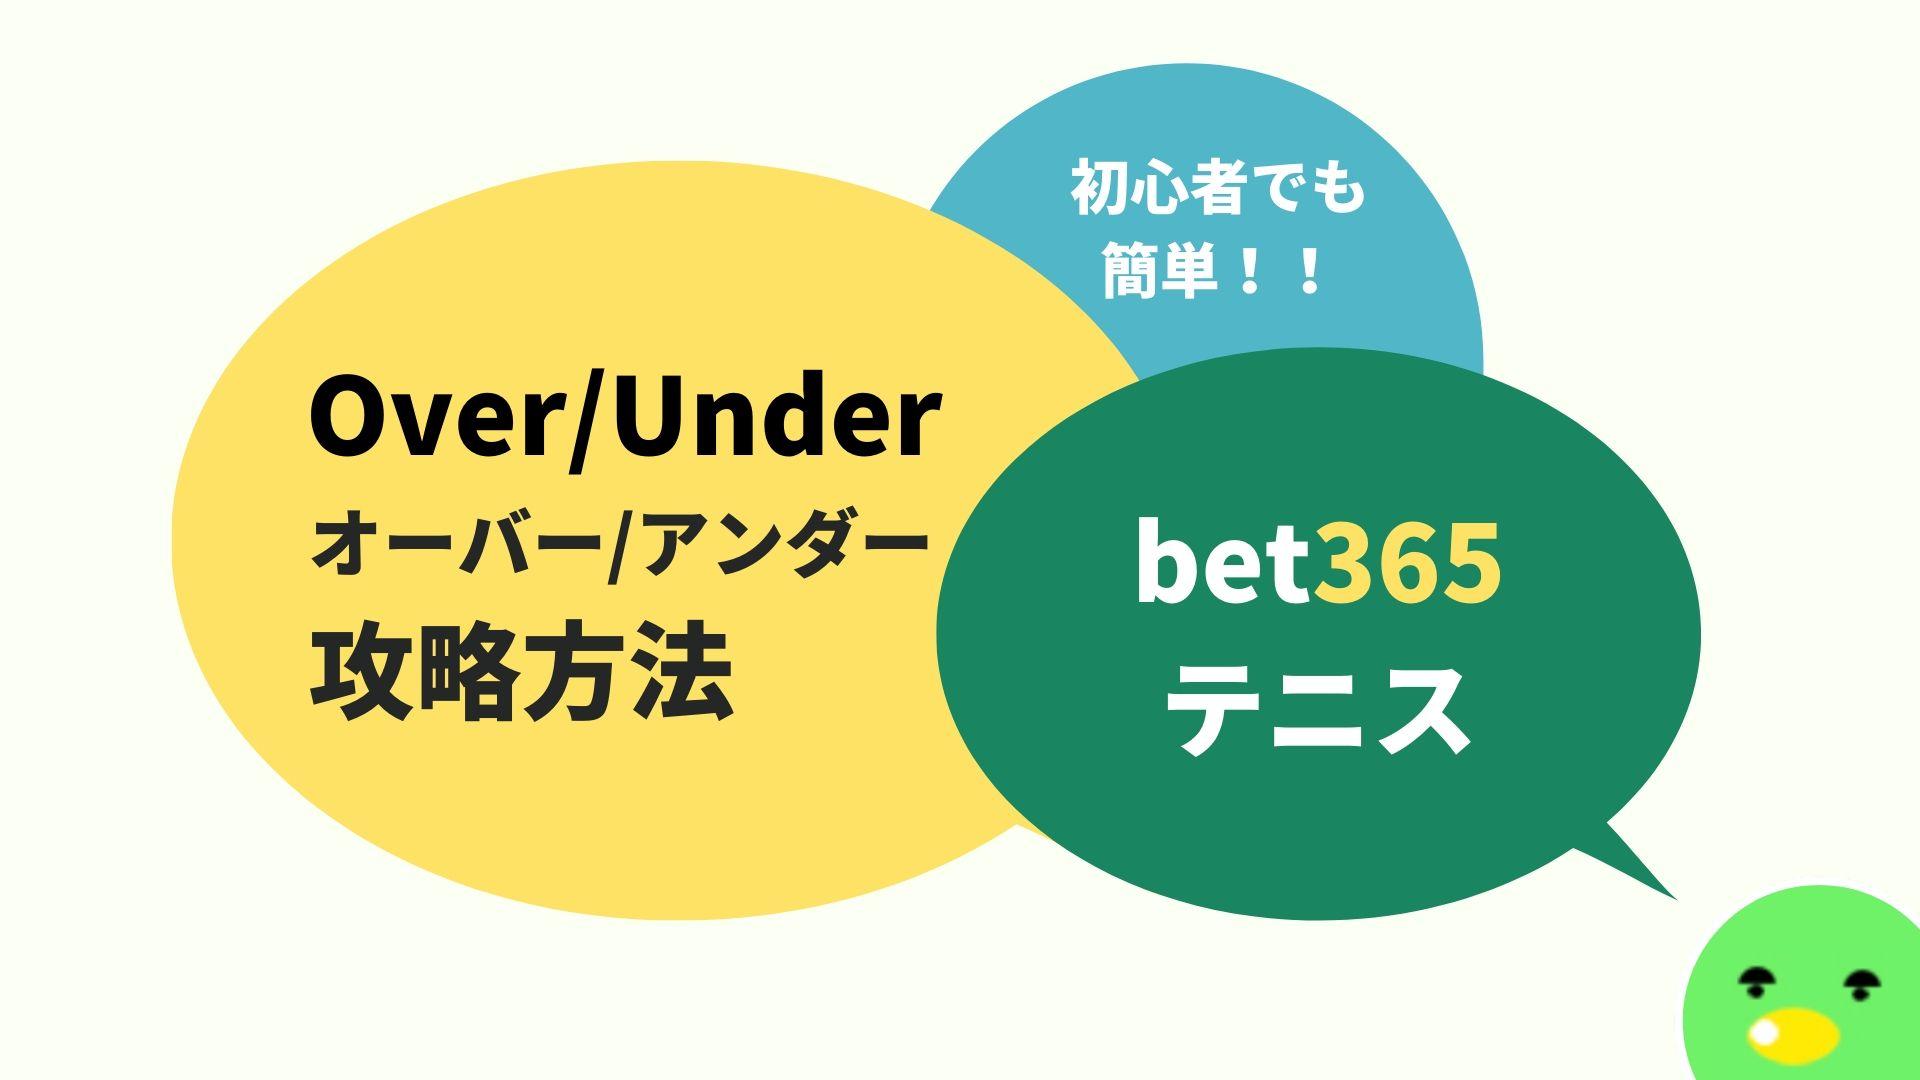 bet365のテニスオッズ